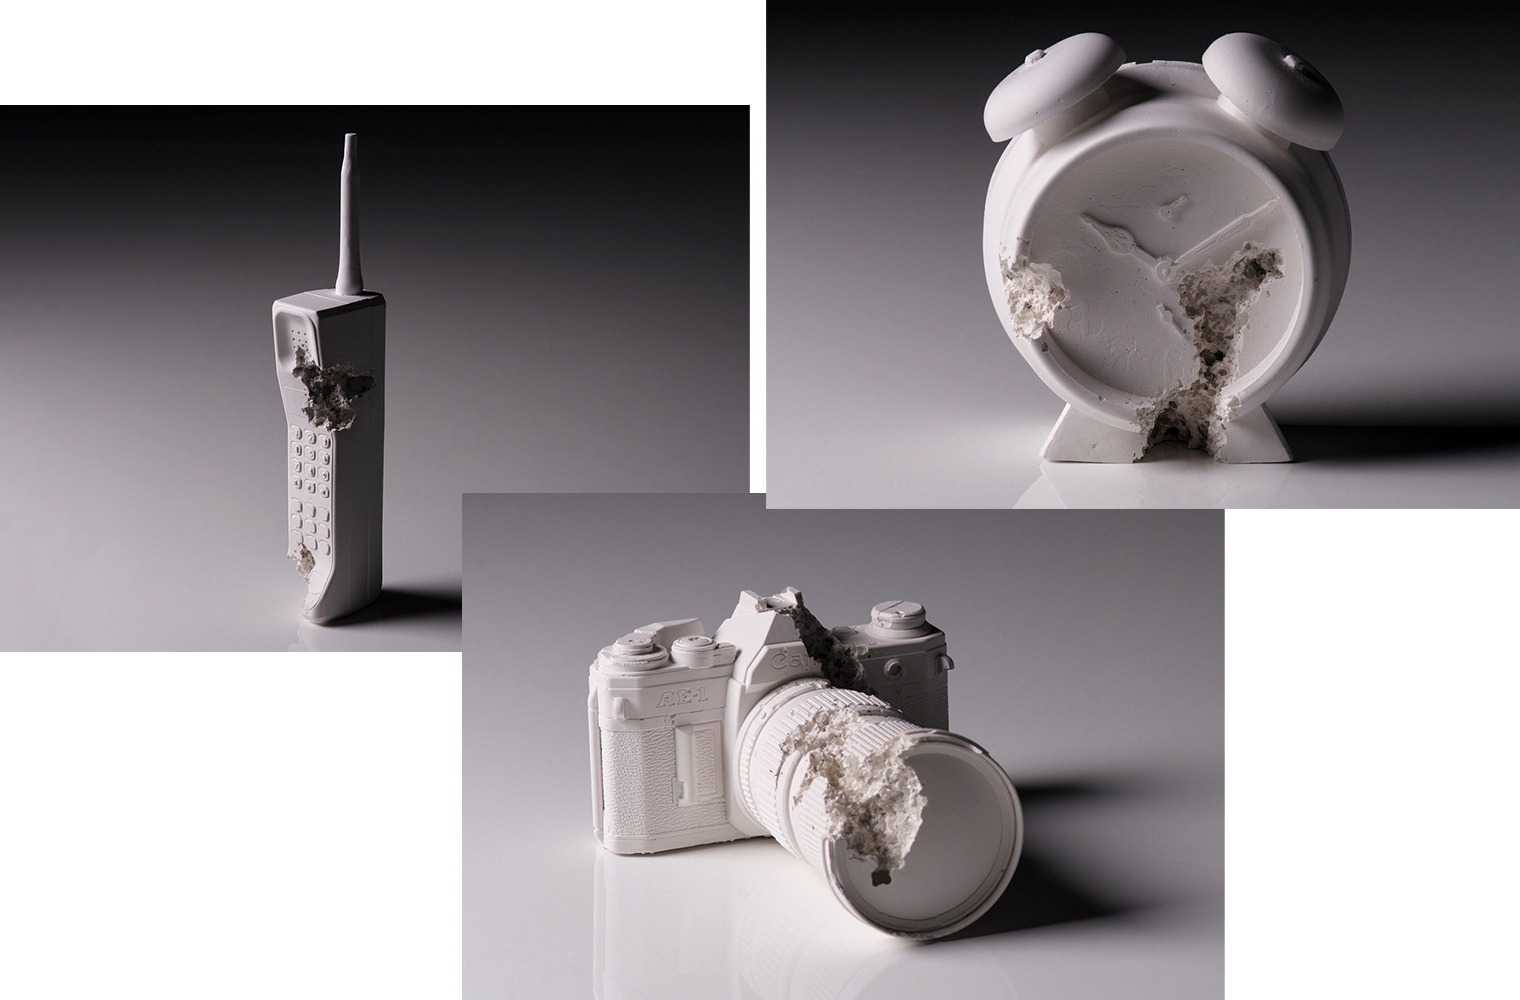 Дэниел Аршам — предметы из проекта Future Relic